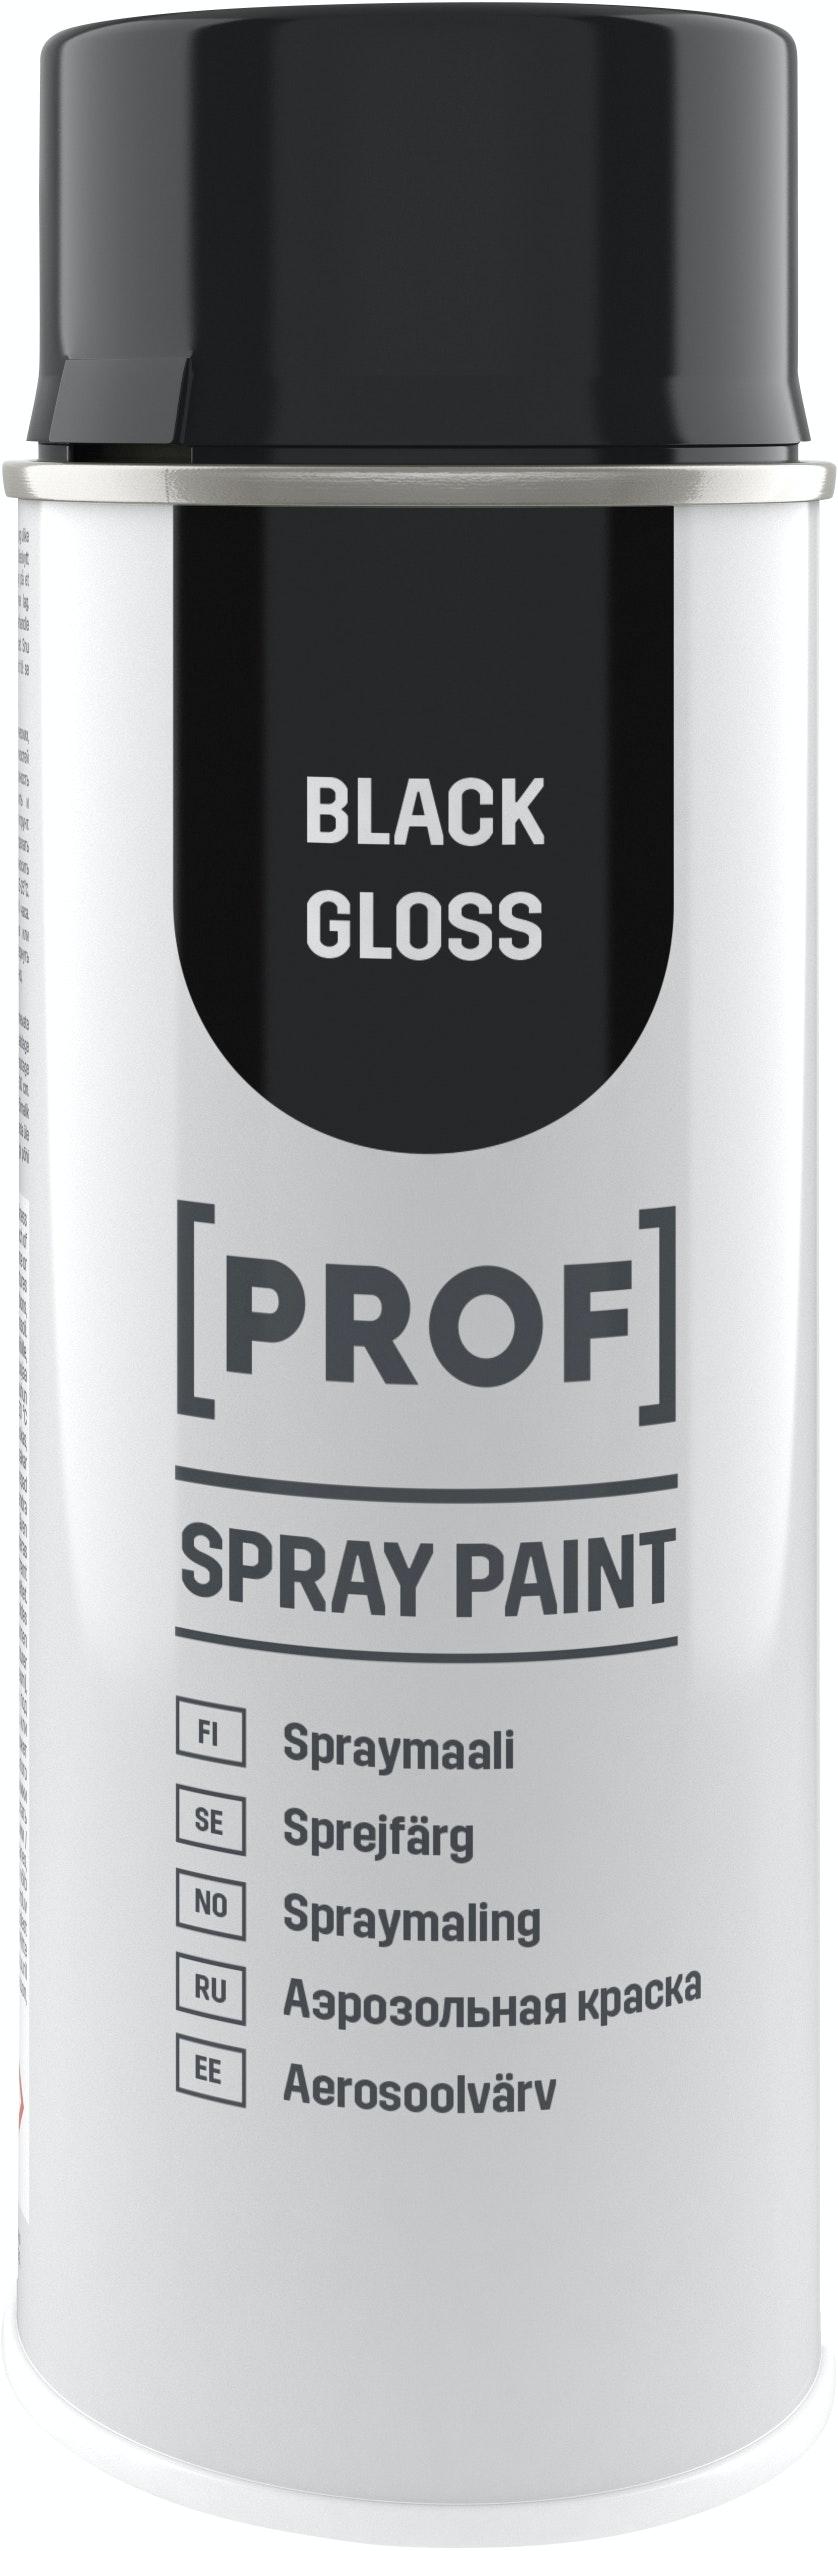 Sprayfärg Prof Professional Blank Svart 400ml